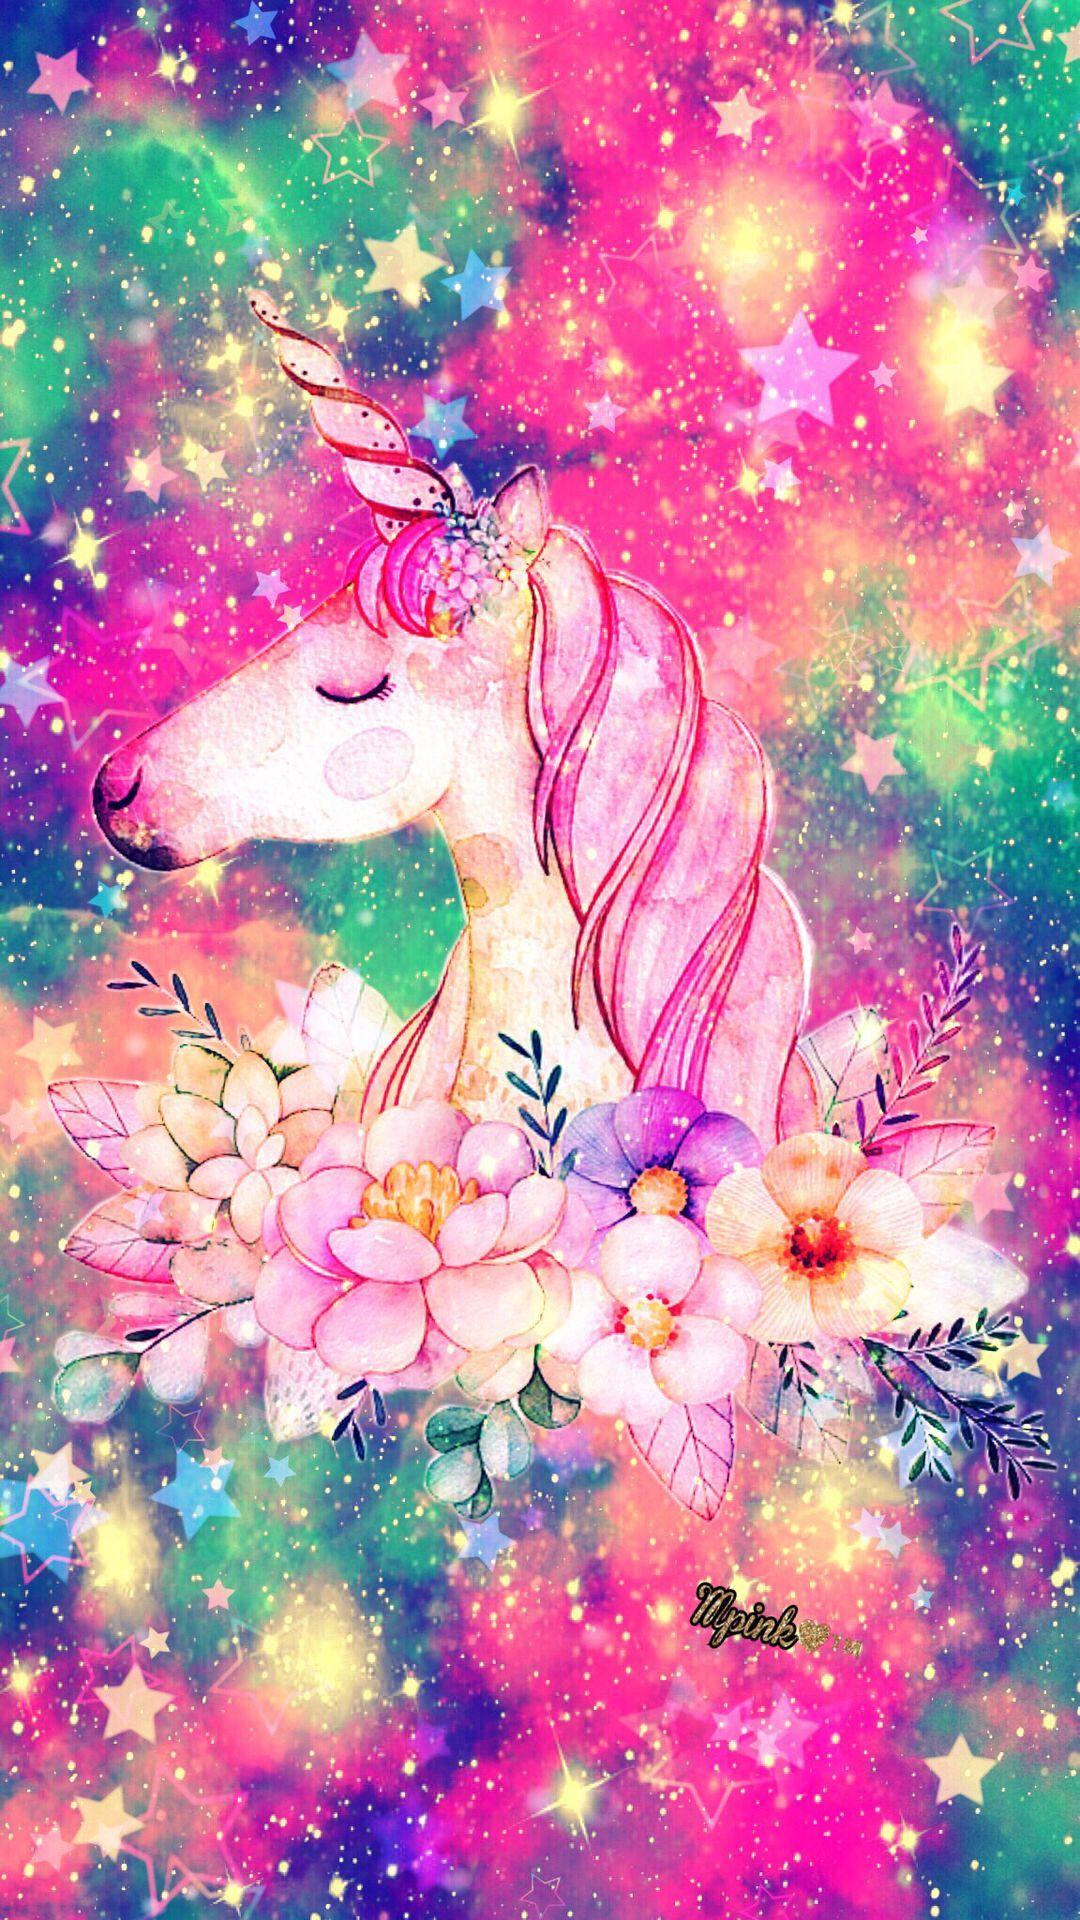 Unicorn Wallpaper Cave Galaxy Unicorn Cool Wallpapers Novocom Top